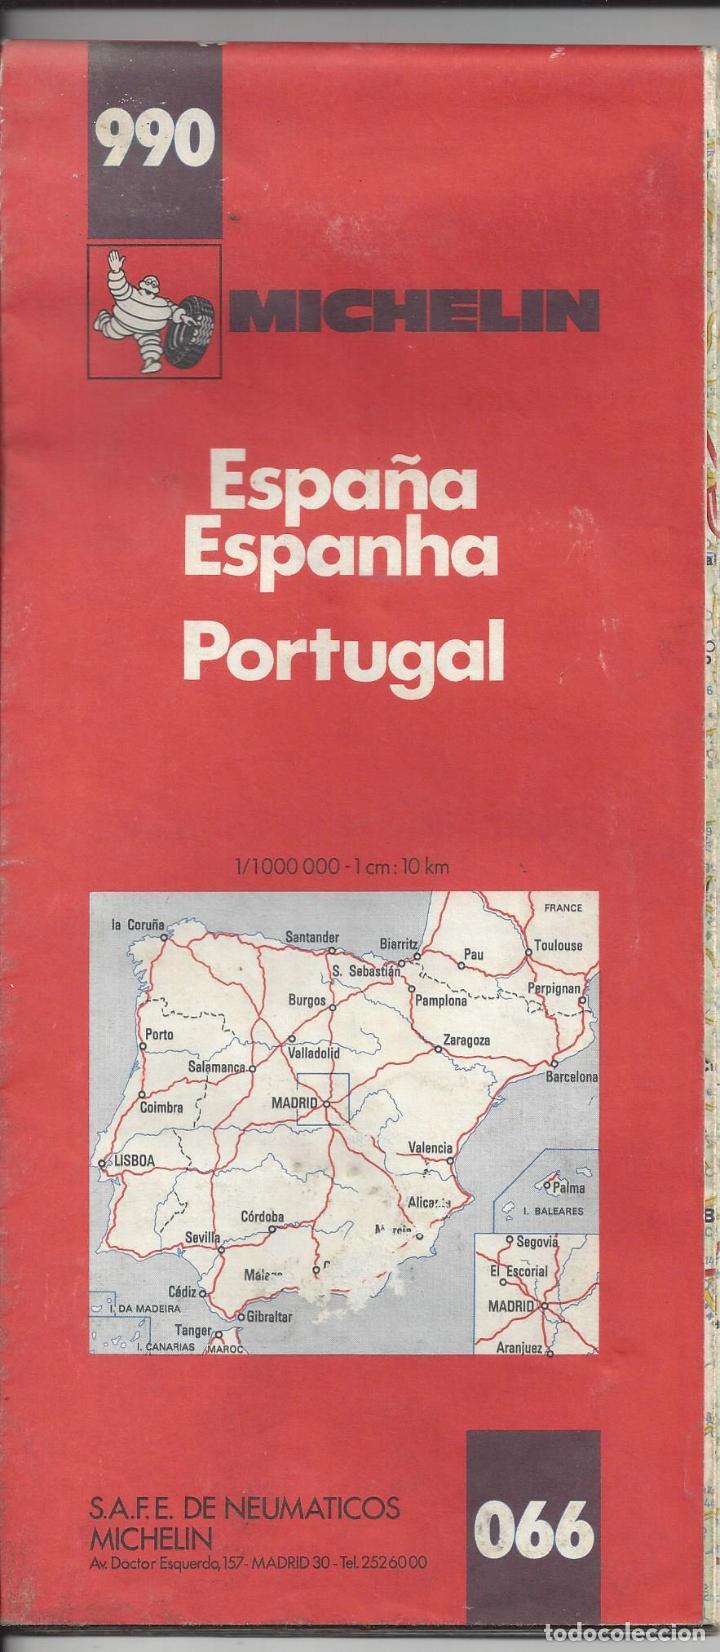 Mapa Michelin Espana Y Portugal Nº 990 Ano 19 Sold Through